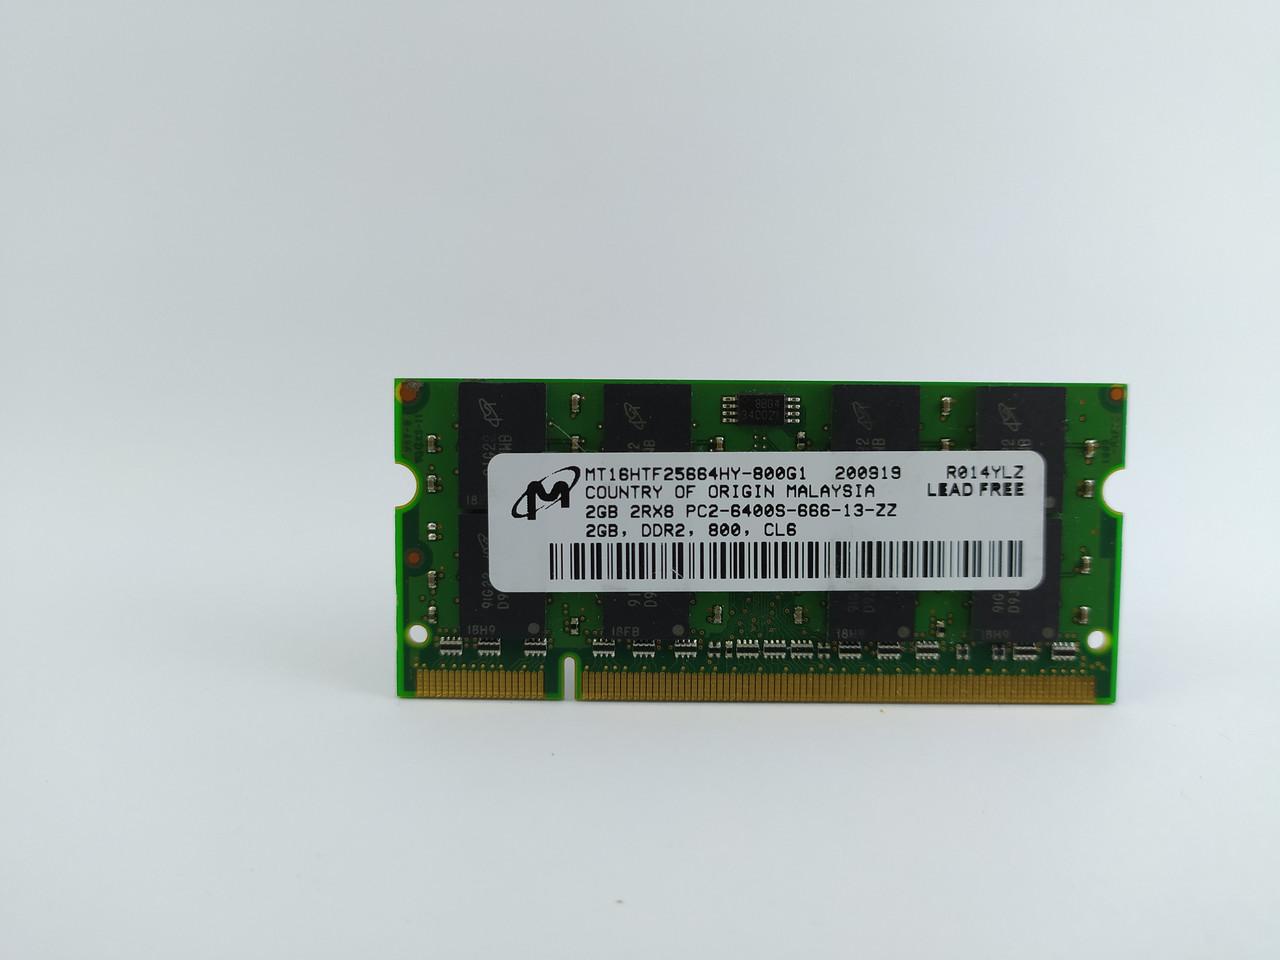 Оперативная память для ноутбука SODIMM Micron DDR2 2Gb 800MHz PC2-6400S (MT16HTF25664HY-800G1) Б/У